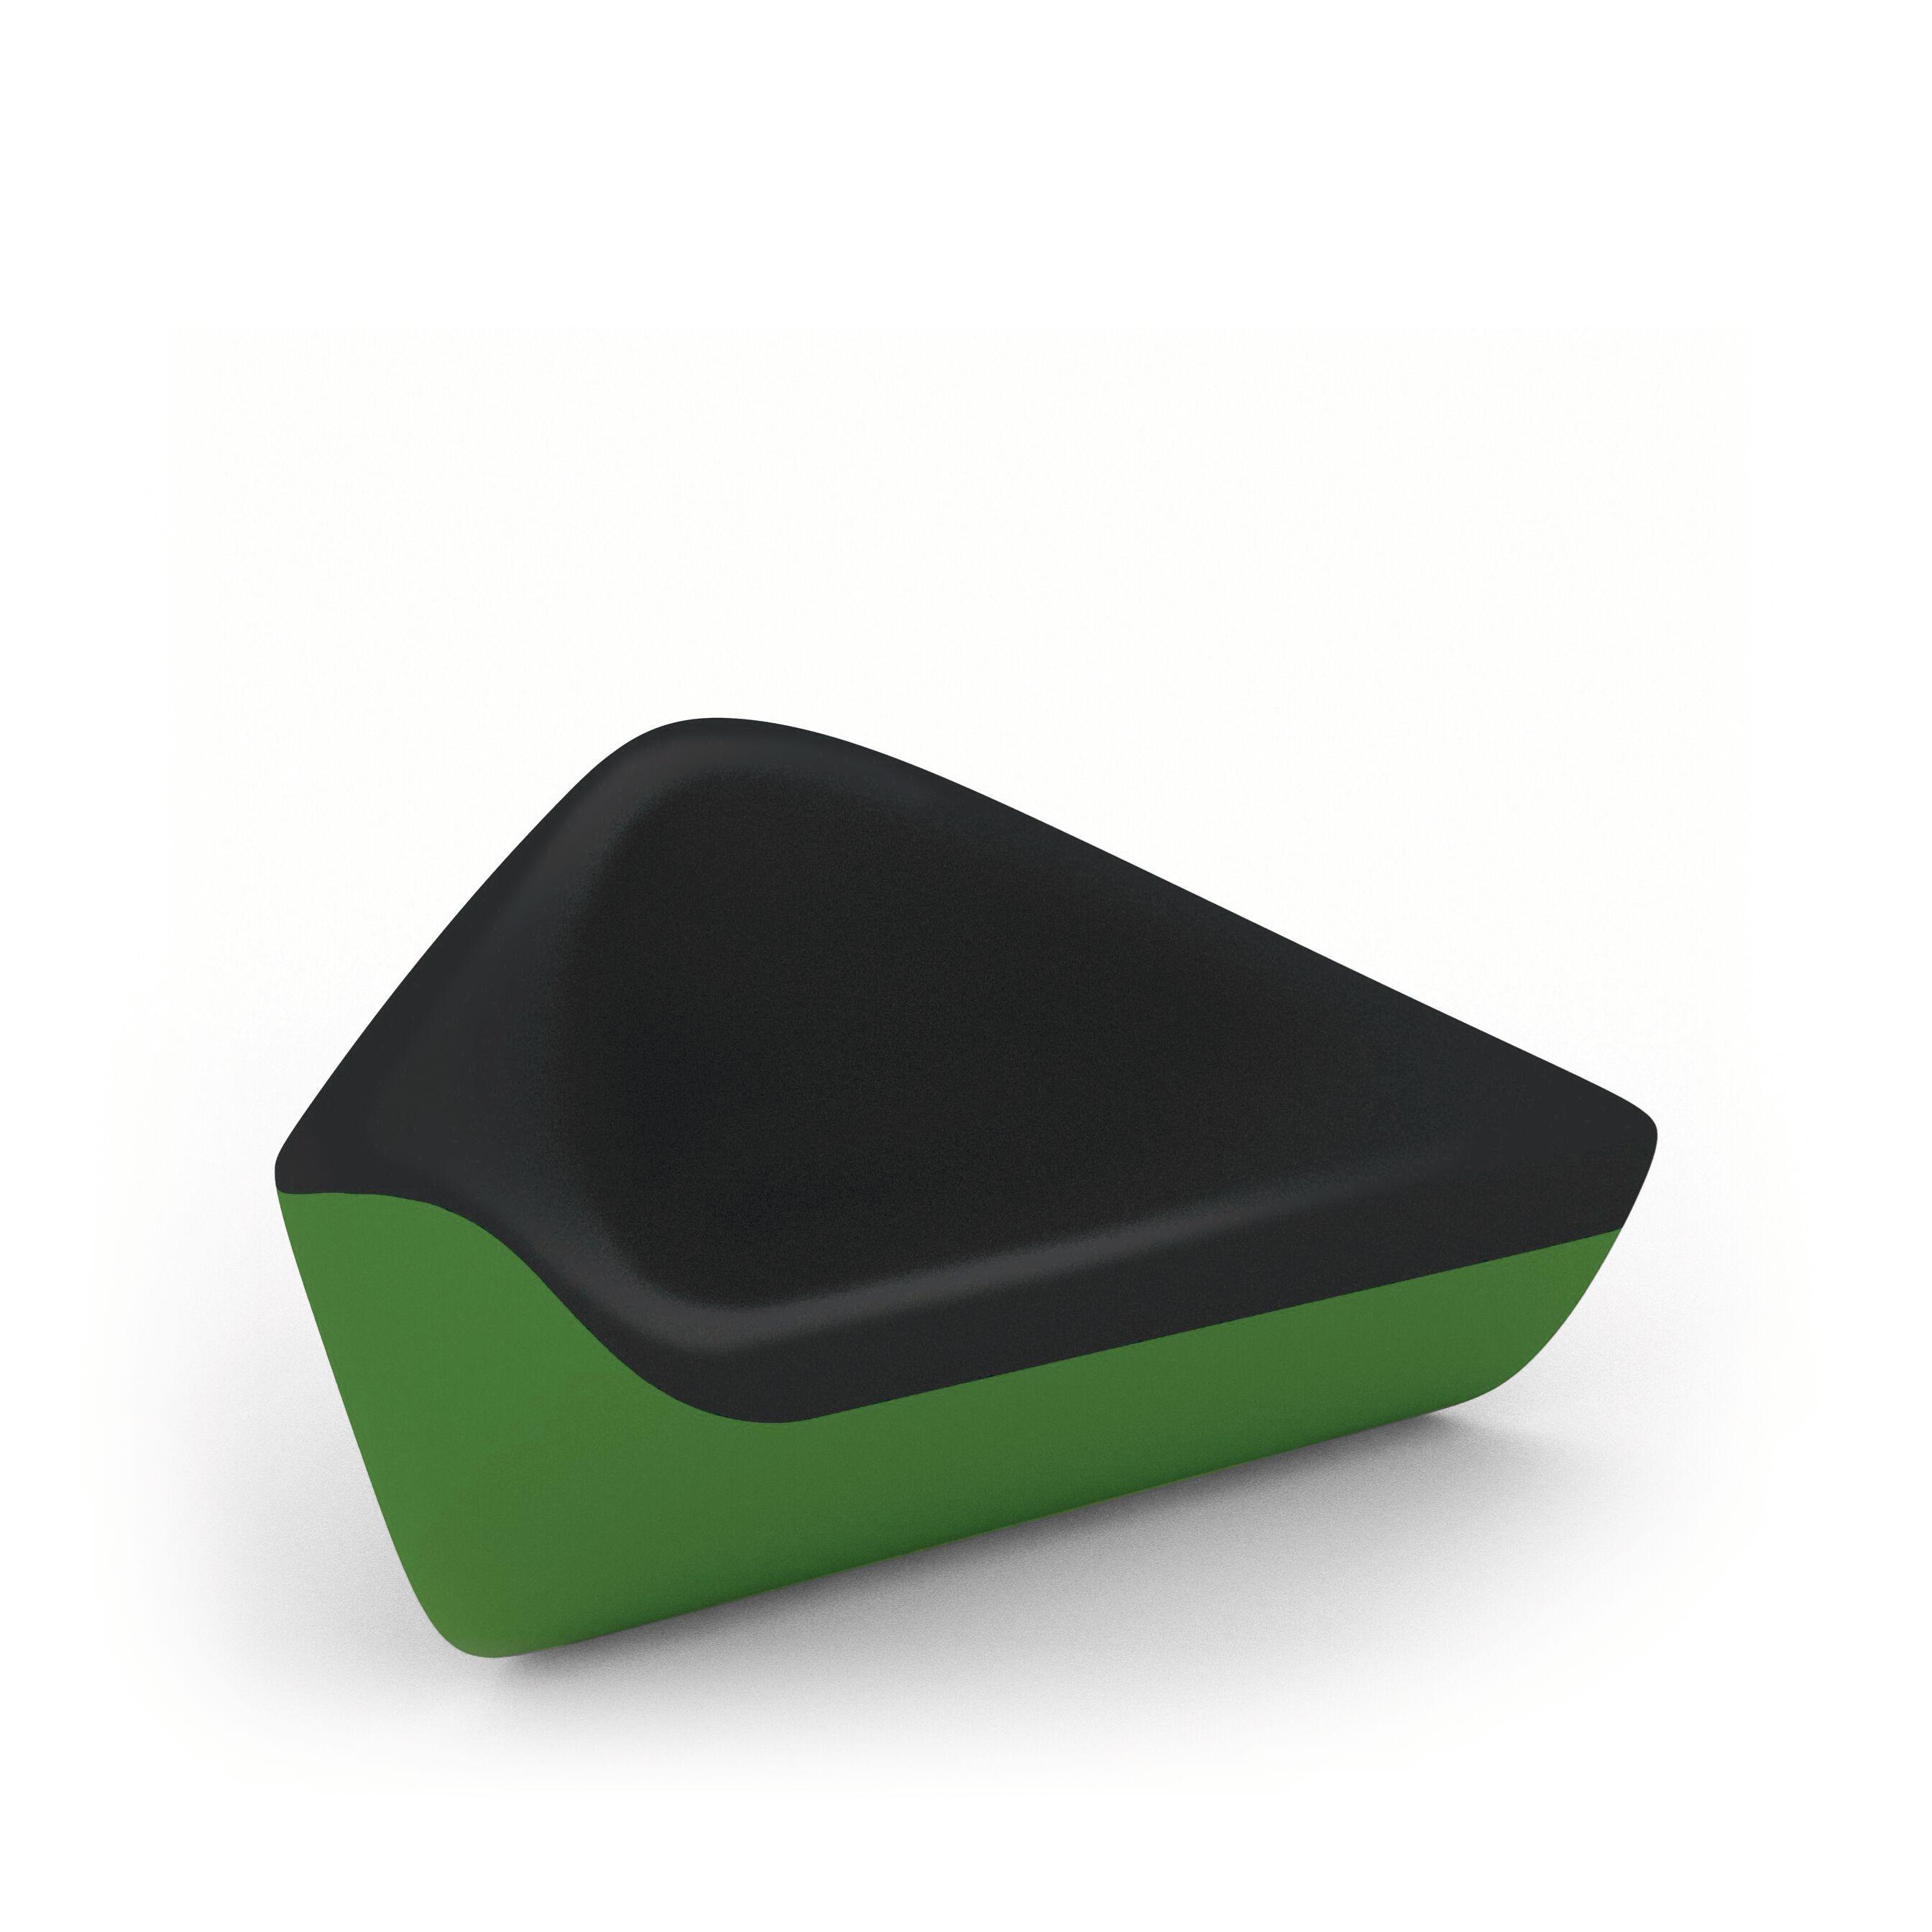 04-WK-Seating_Stones_Lounge_Chair-0006-H.tif